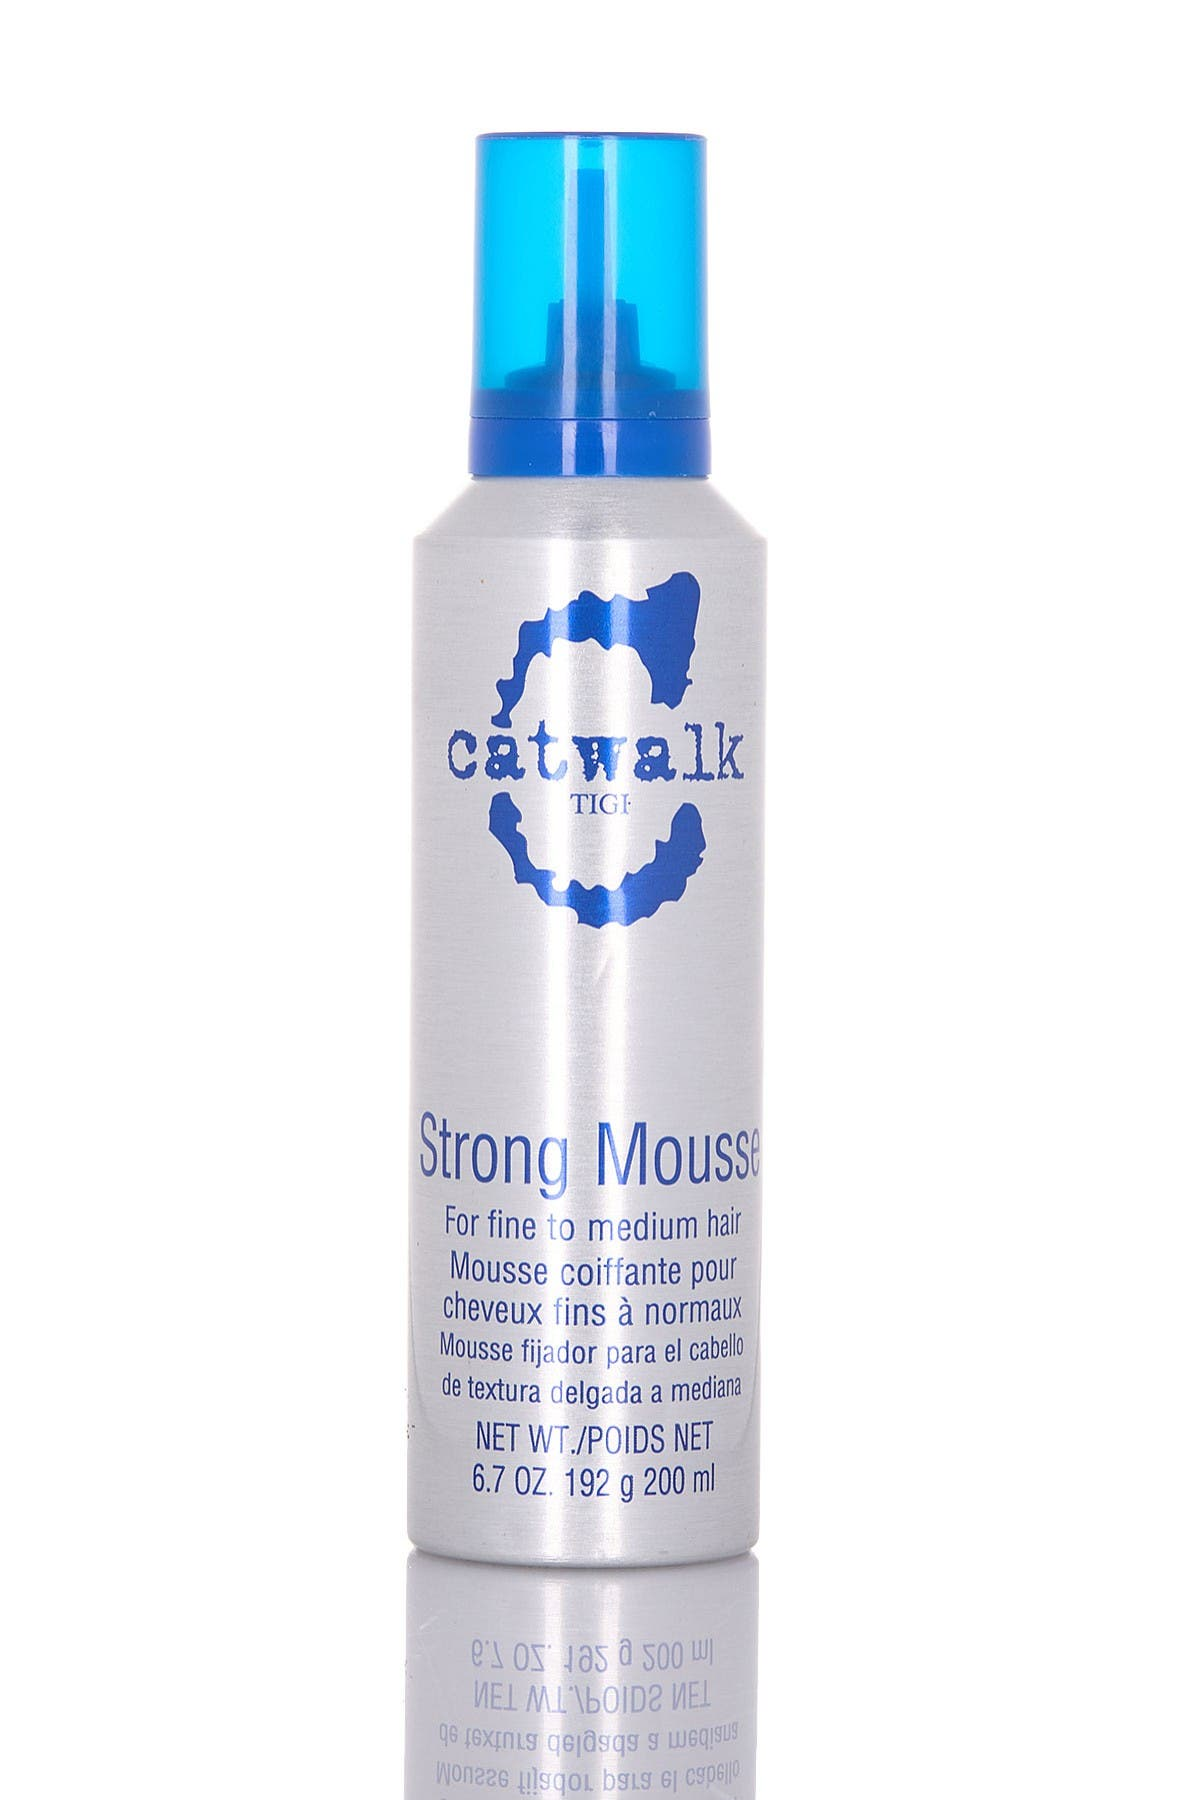 Image of TIGI Catwalk Strong Mousse - 6.7 oz.